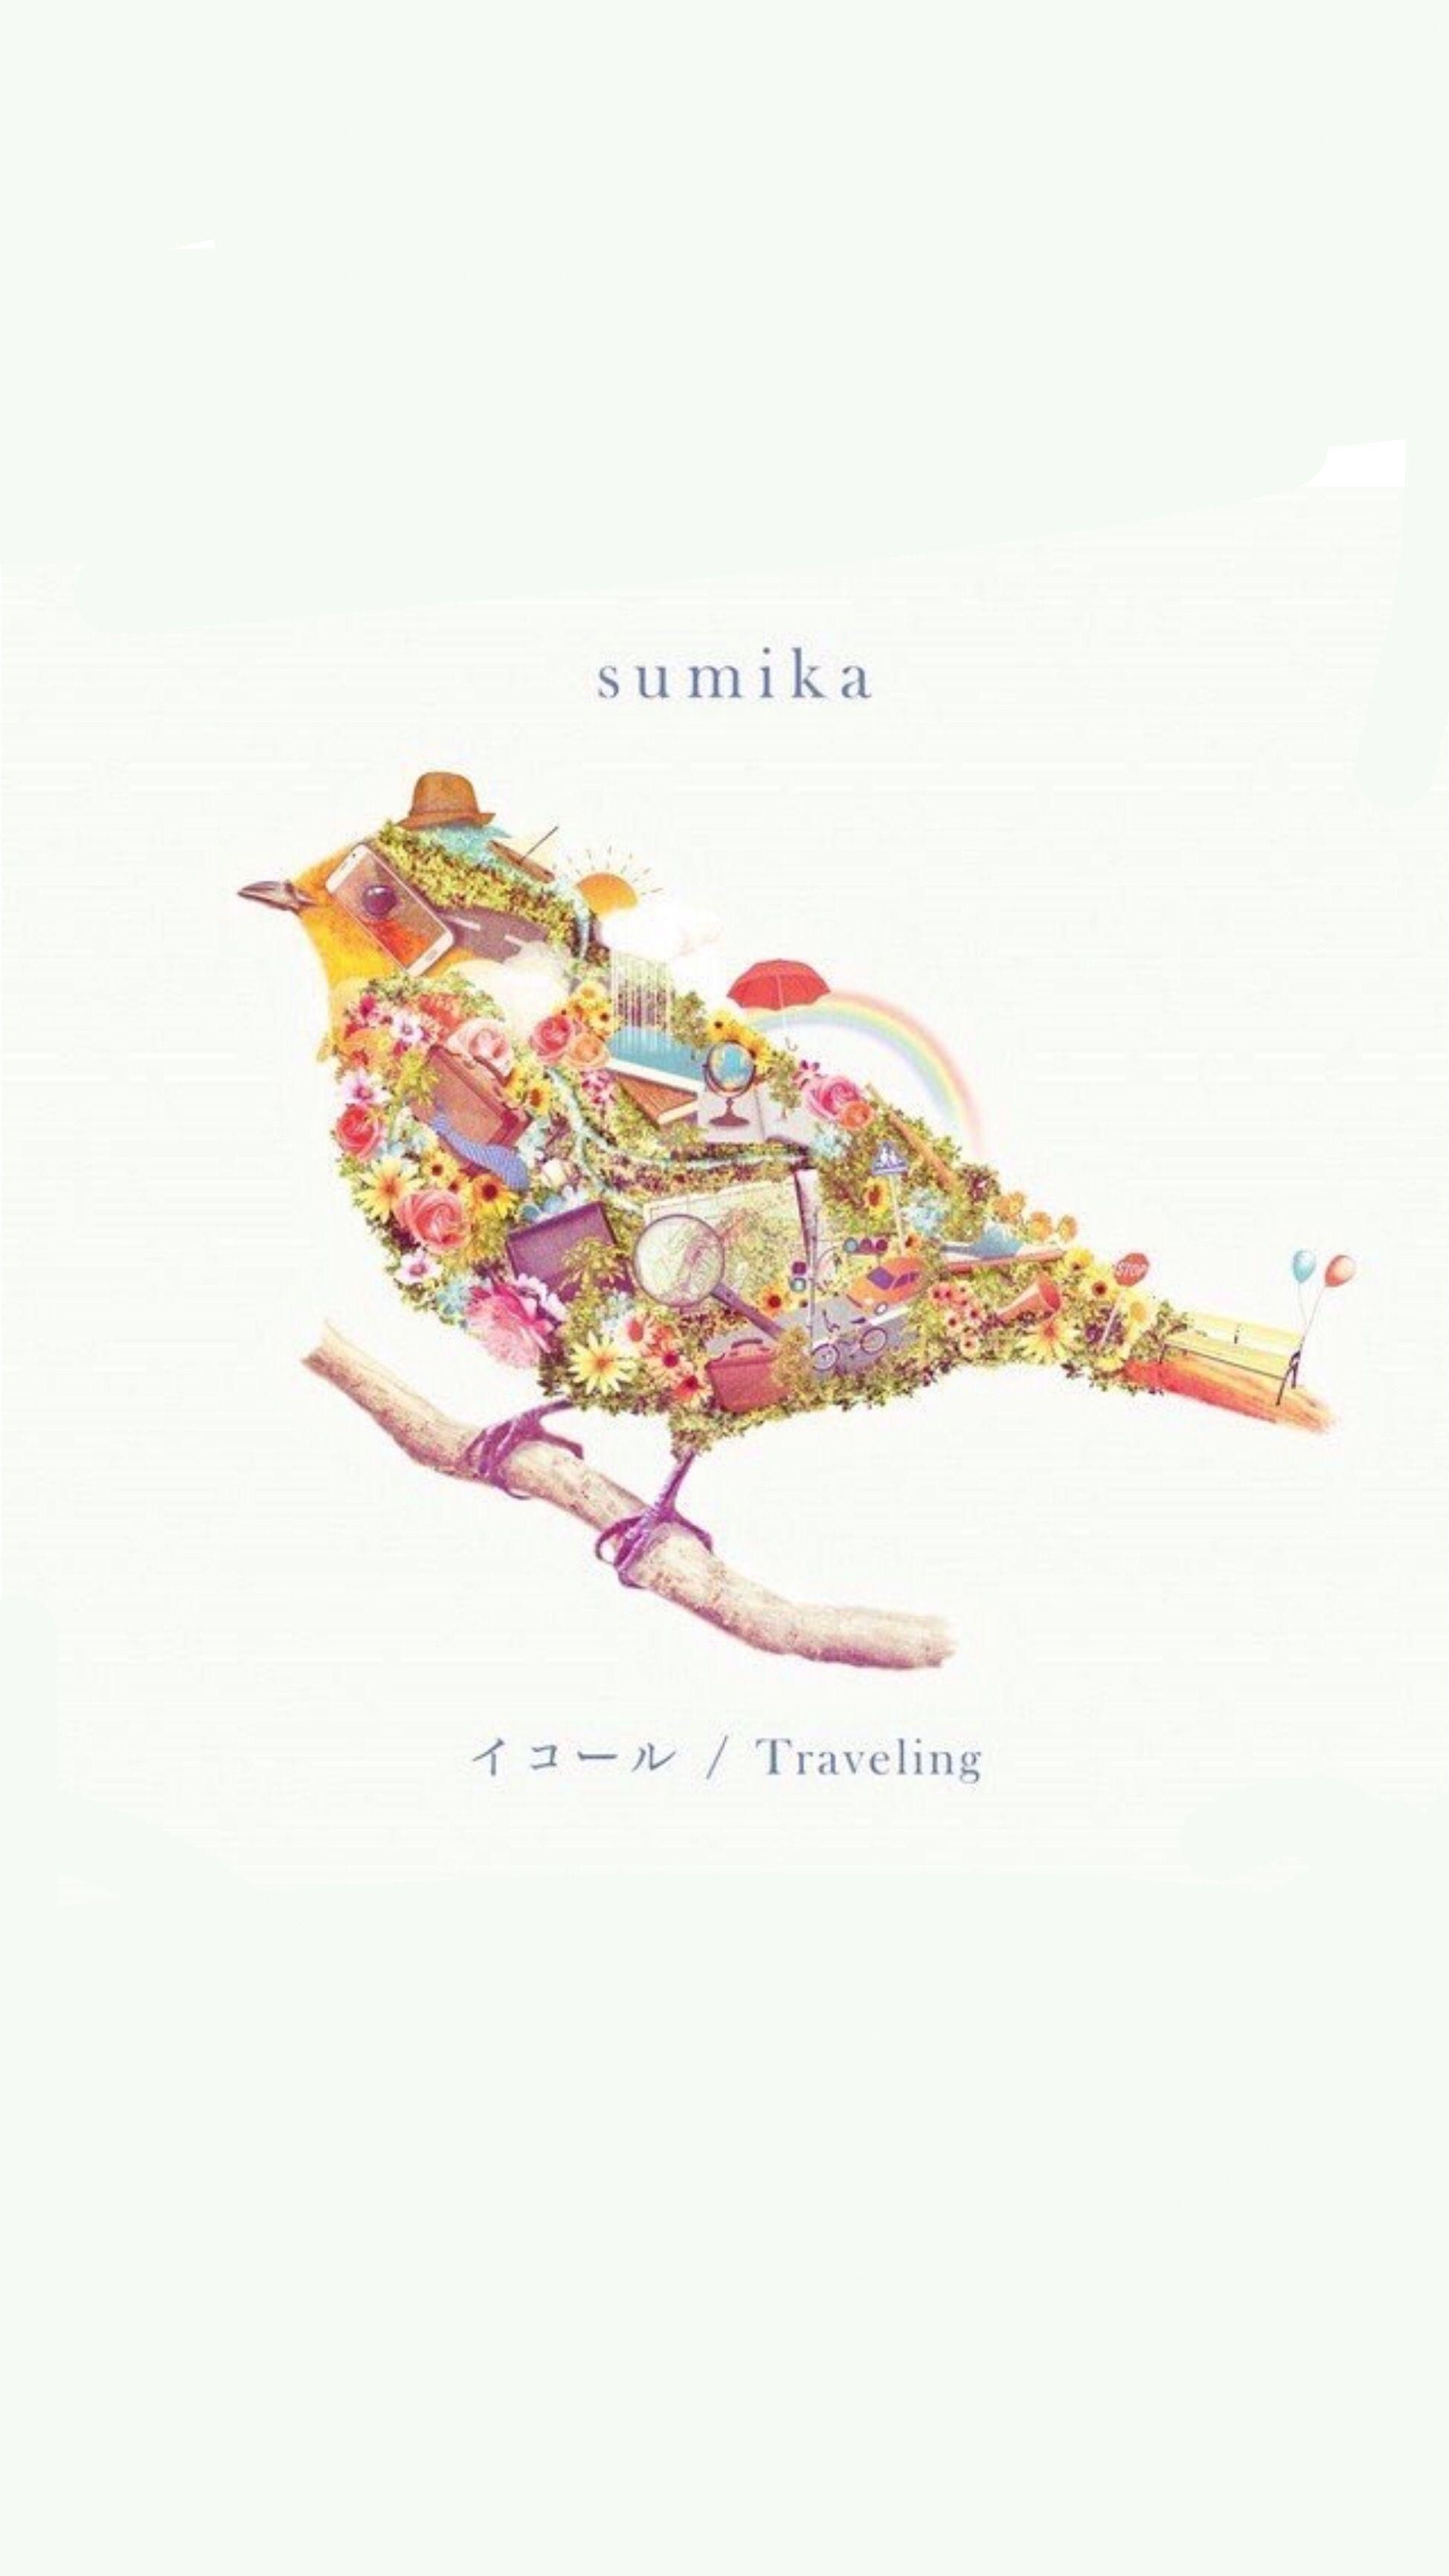 Sumika おしゃれまとめの人気アイデア Pinterest Momoka Sumika バンド バンドロゴ バンド